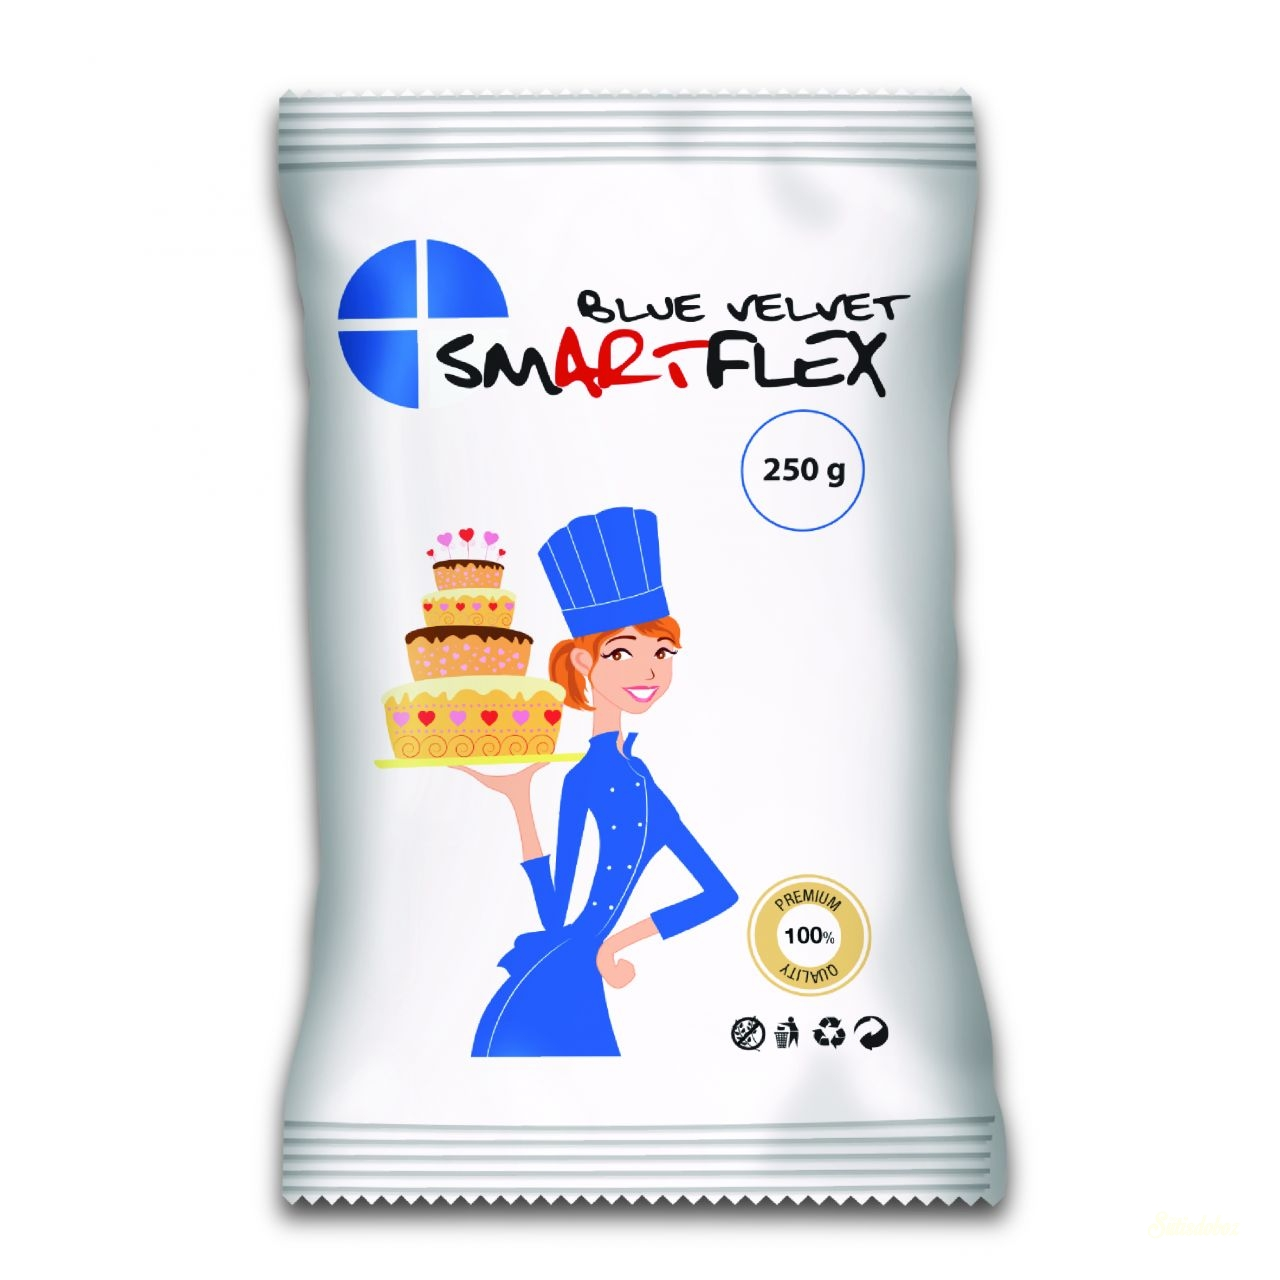 Smartflex Color Velvet massza 250g - Kék